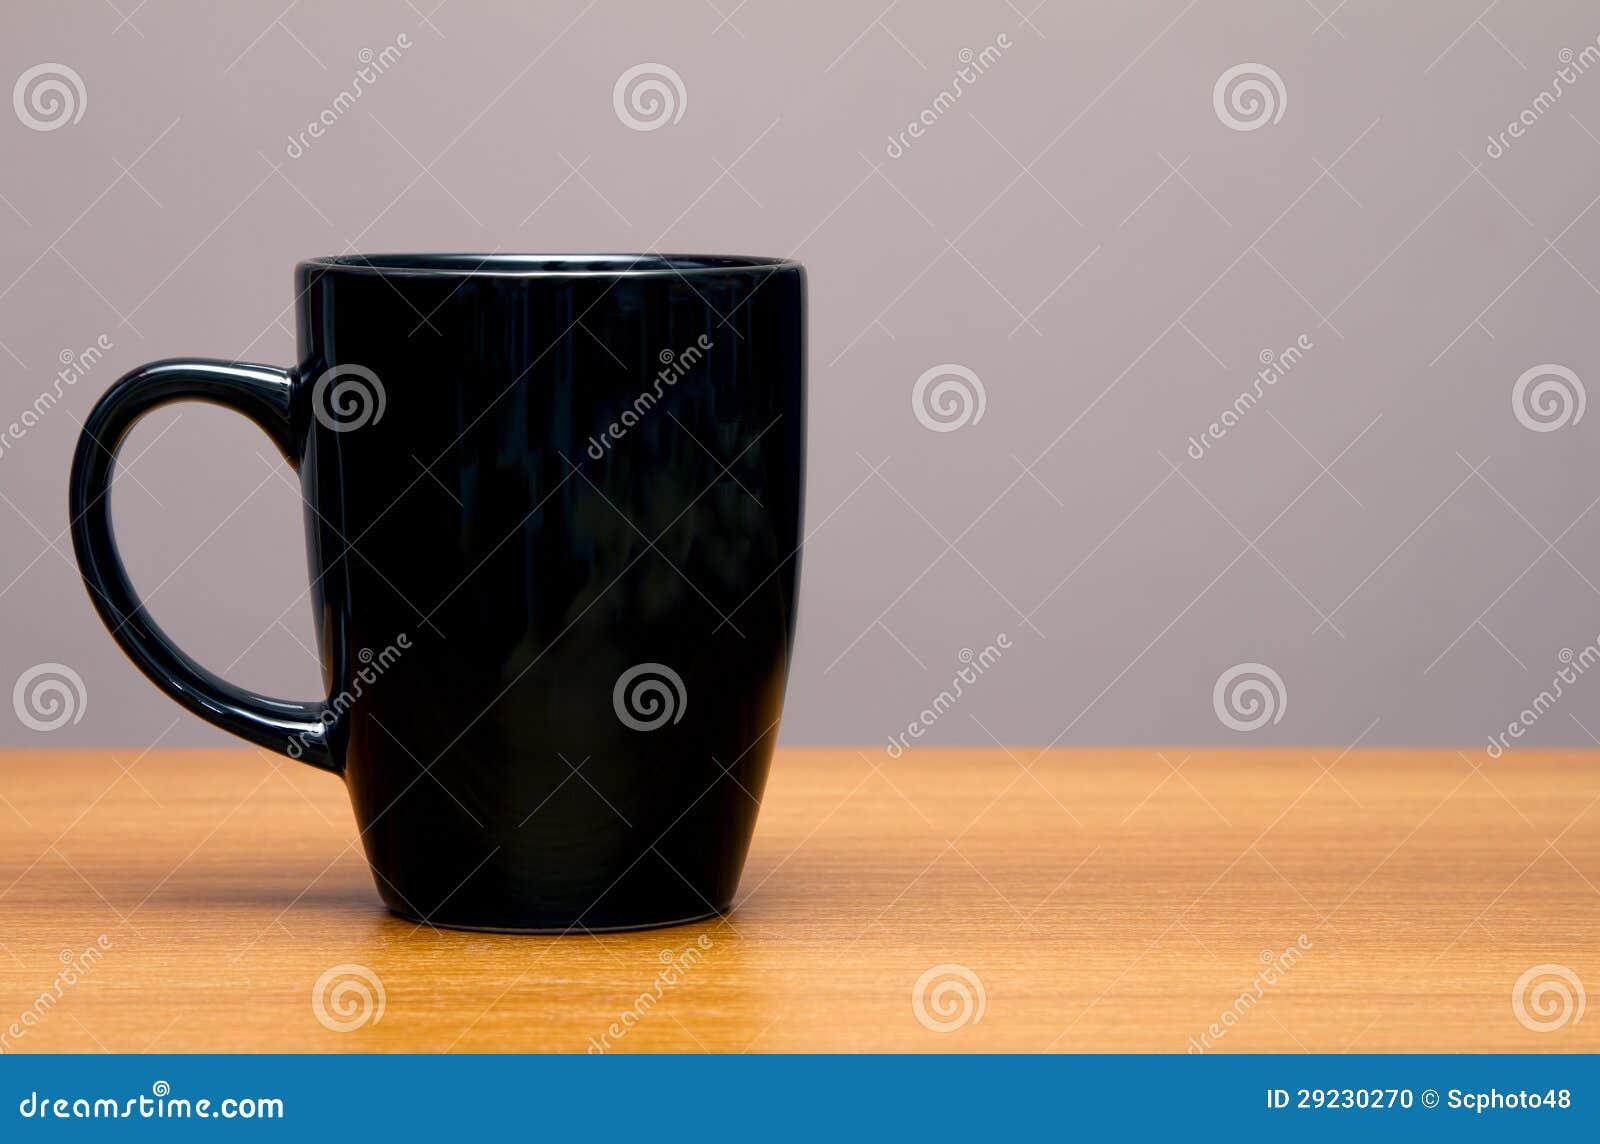 Black Coffee Mug On Wood Table Stock Photo Image 29230270